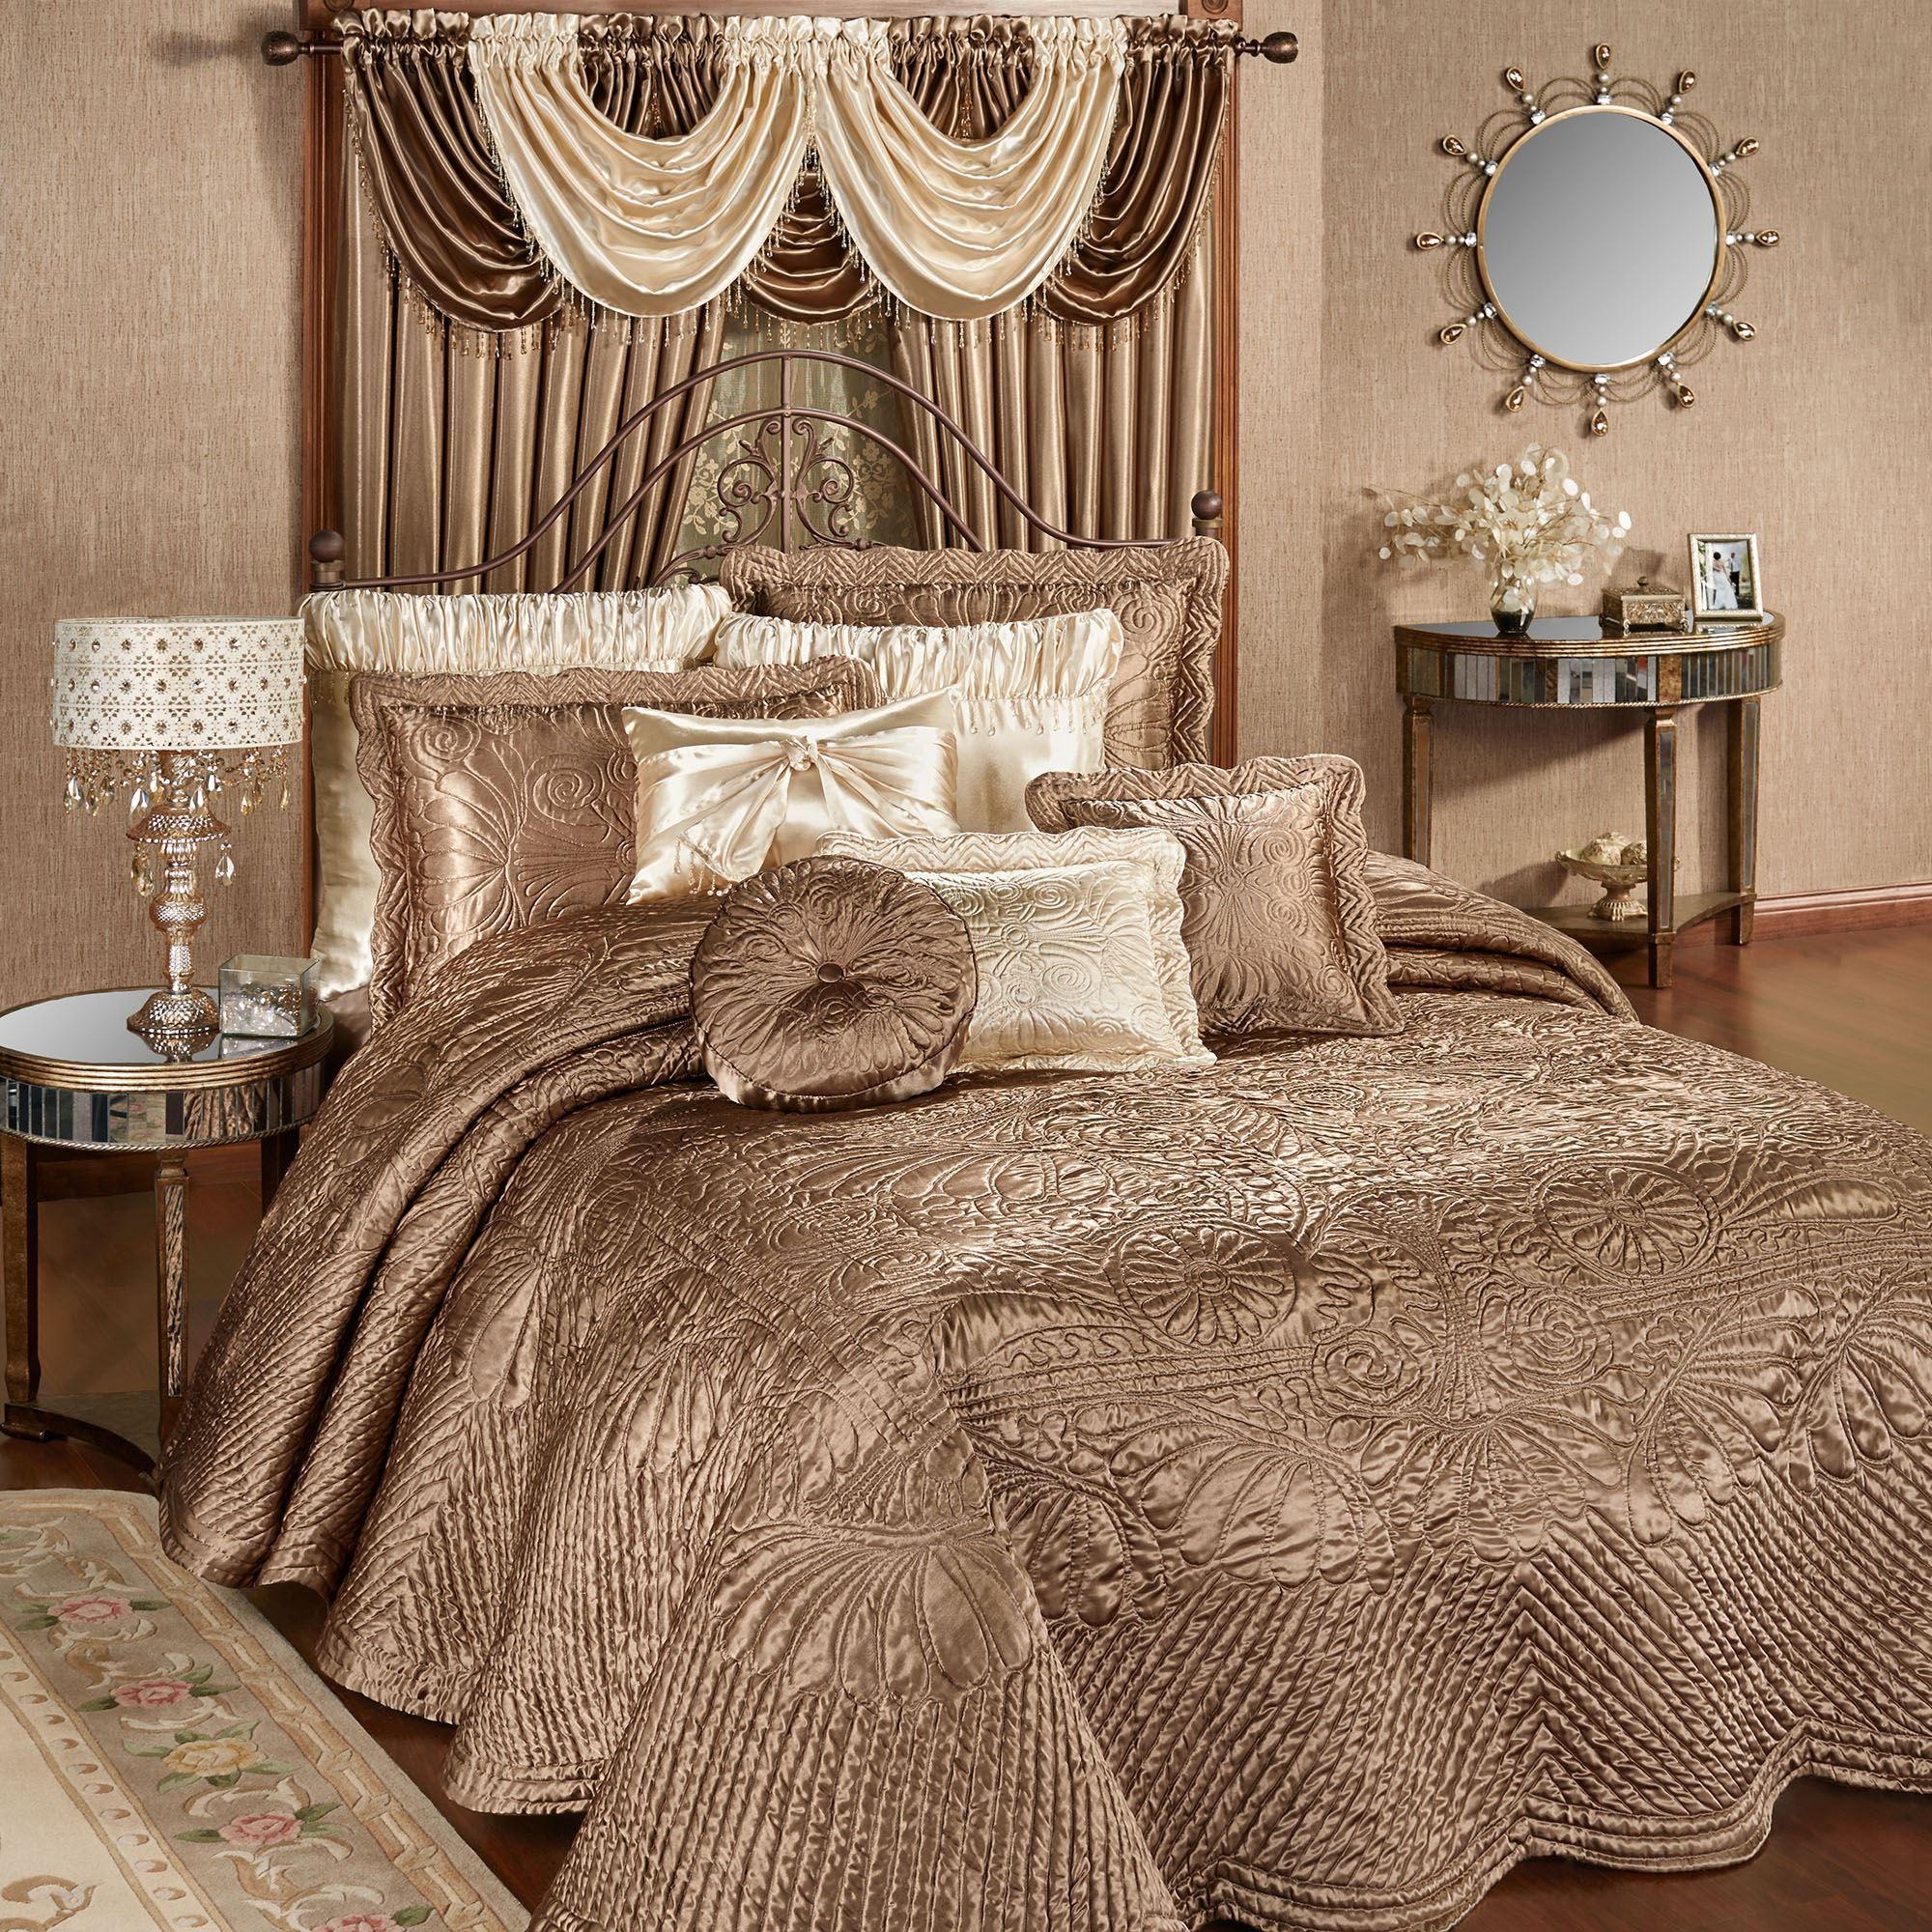 Portia Ii Smoky Topaz Quilted Oversized Bedspread Bedding